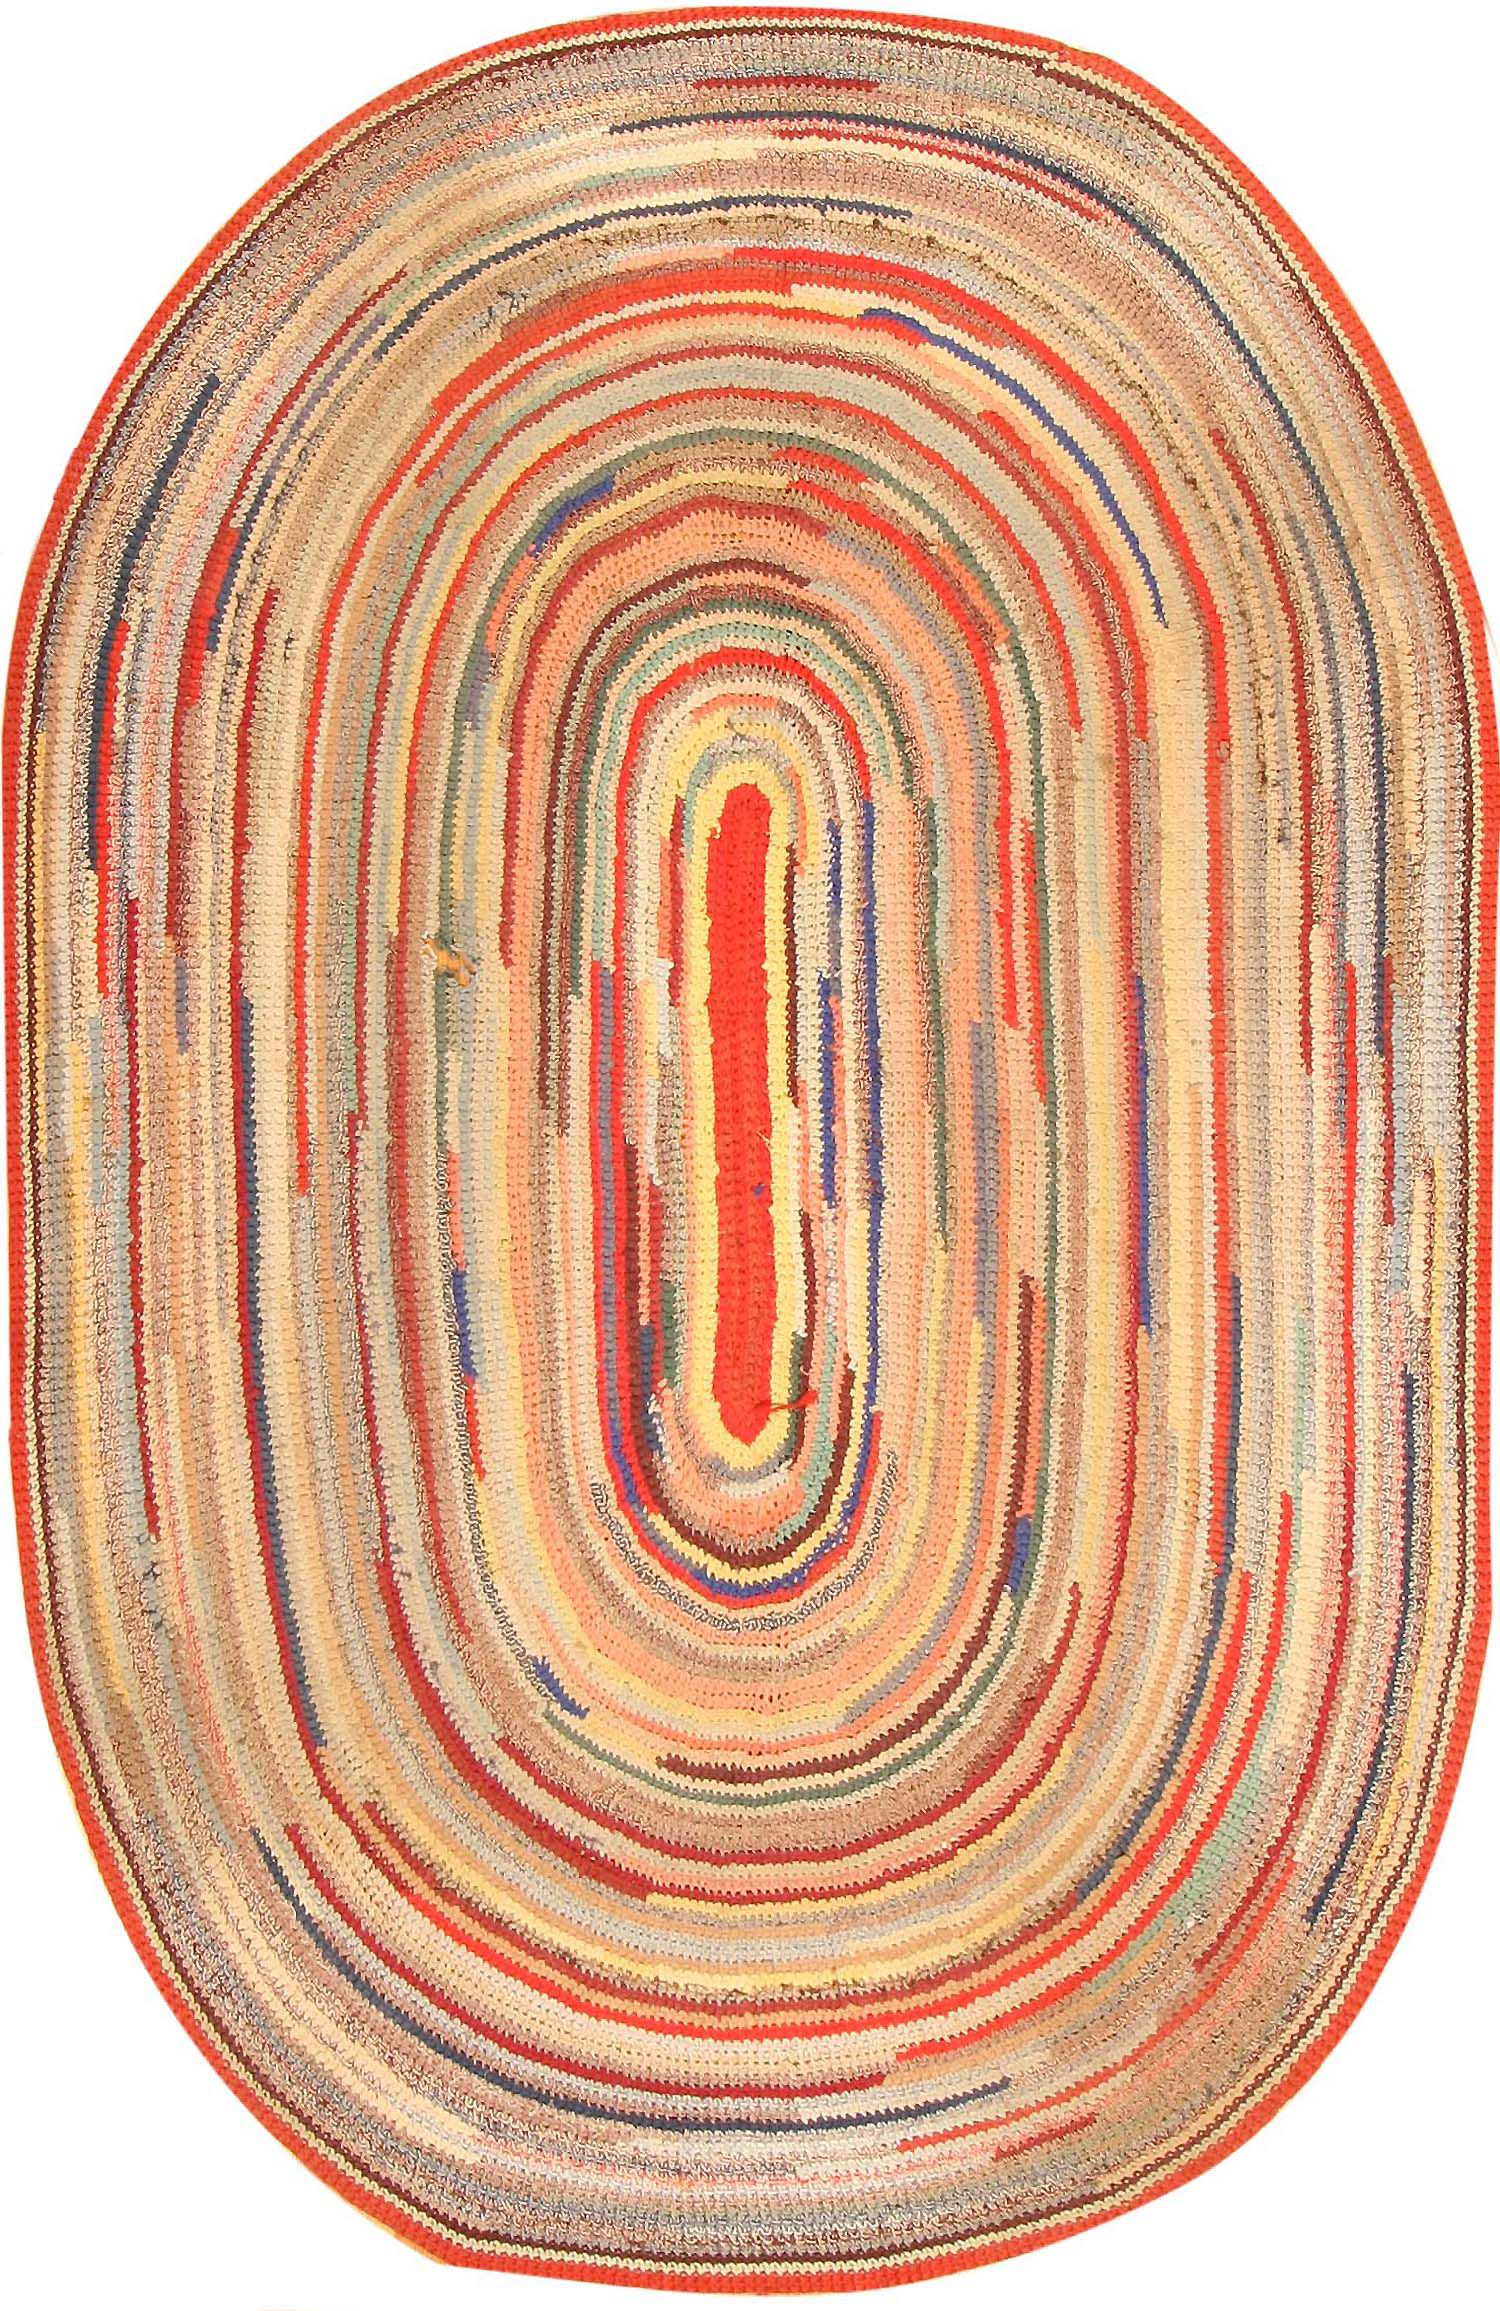 oval rug early american braided rug 1271 nazmiyal TPFAIHD